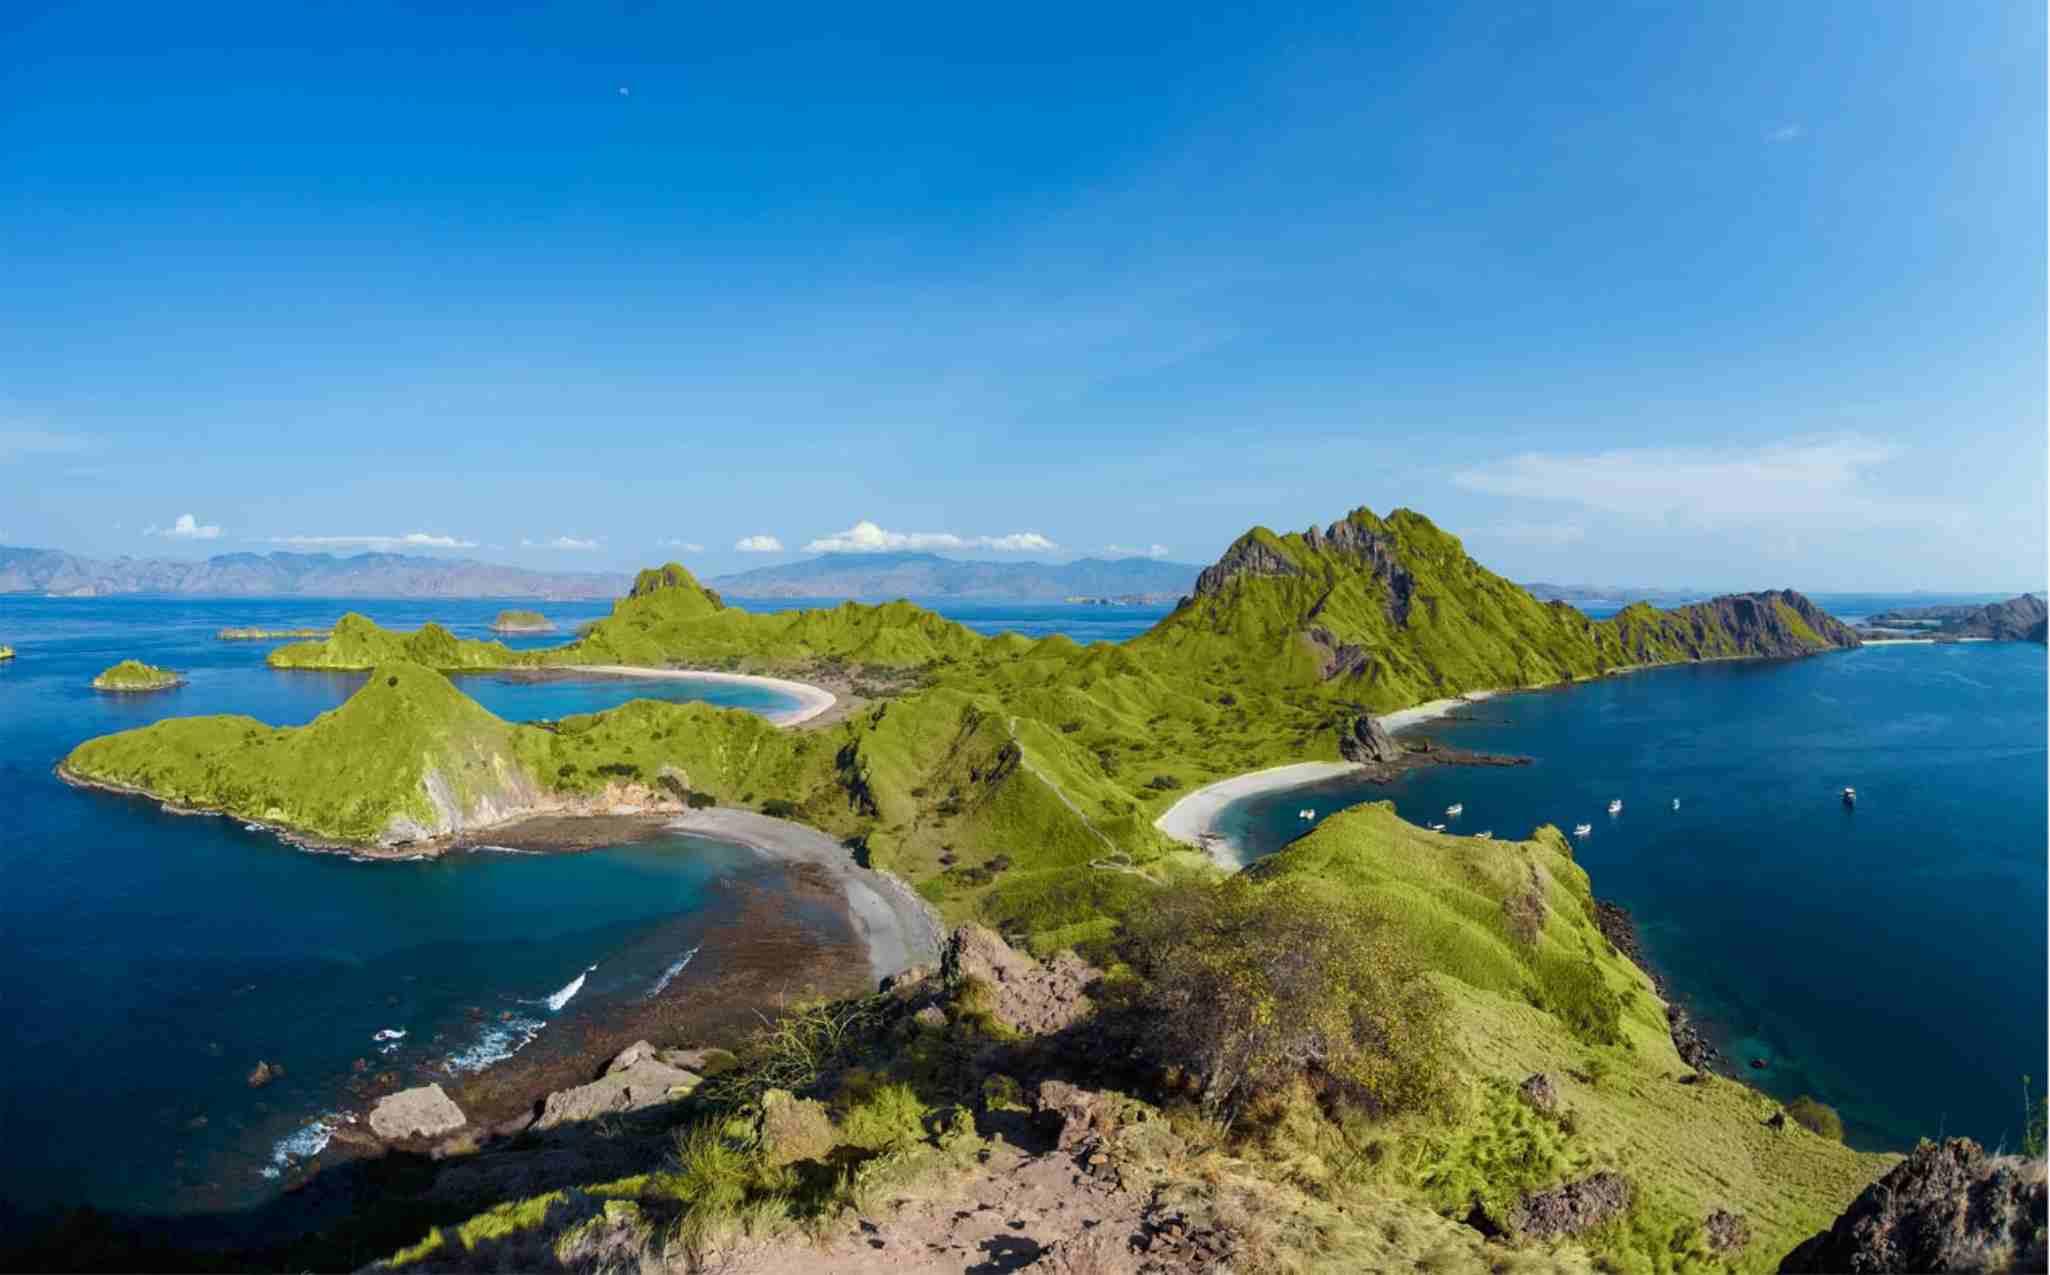 Padar Island Landscape